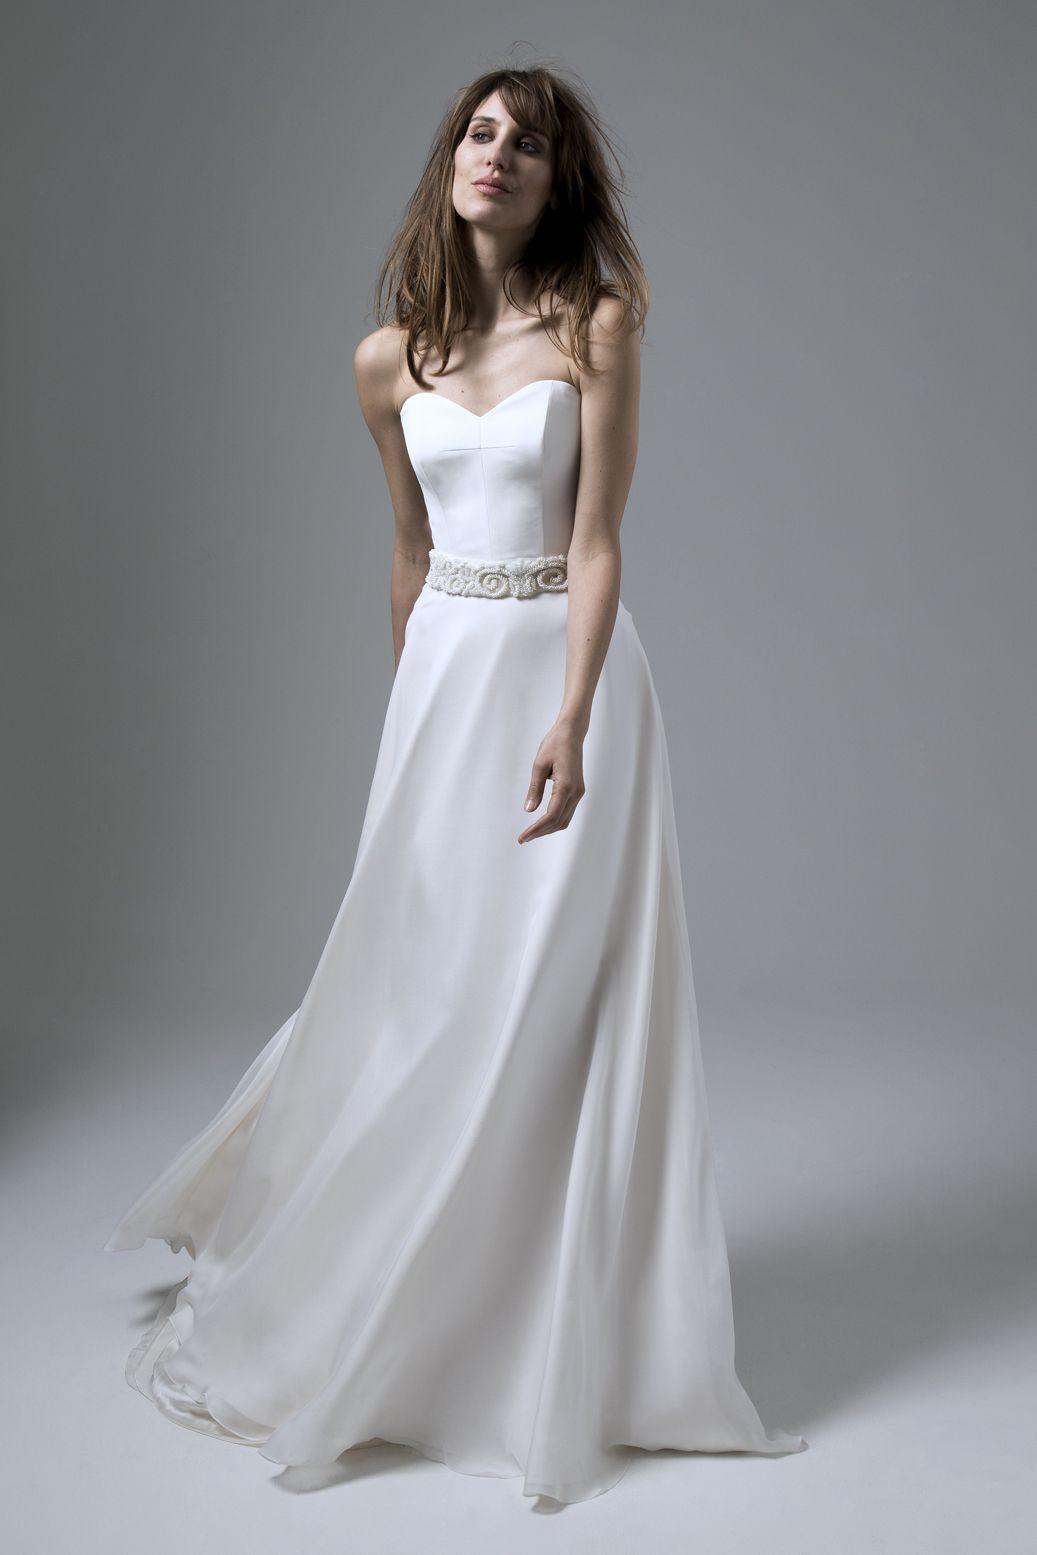 Explore Boned Corsets Bridal Fashion And More